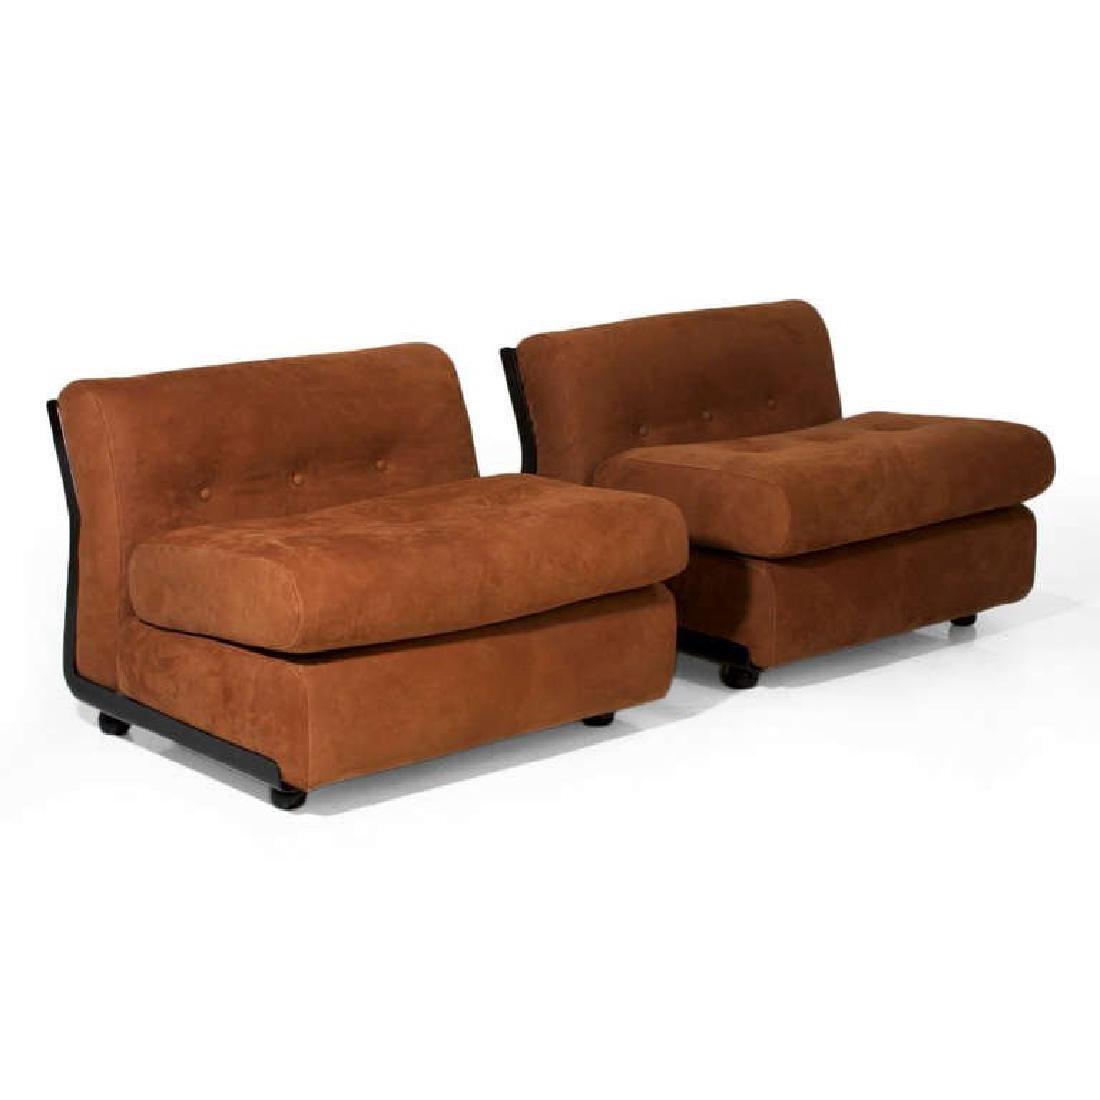 Mario Bellini Amanta Chairs (2) - 2